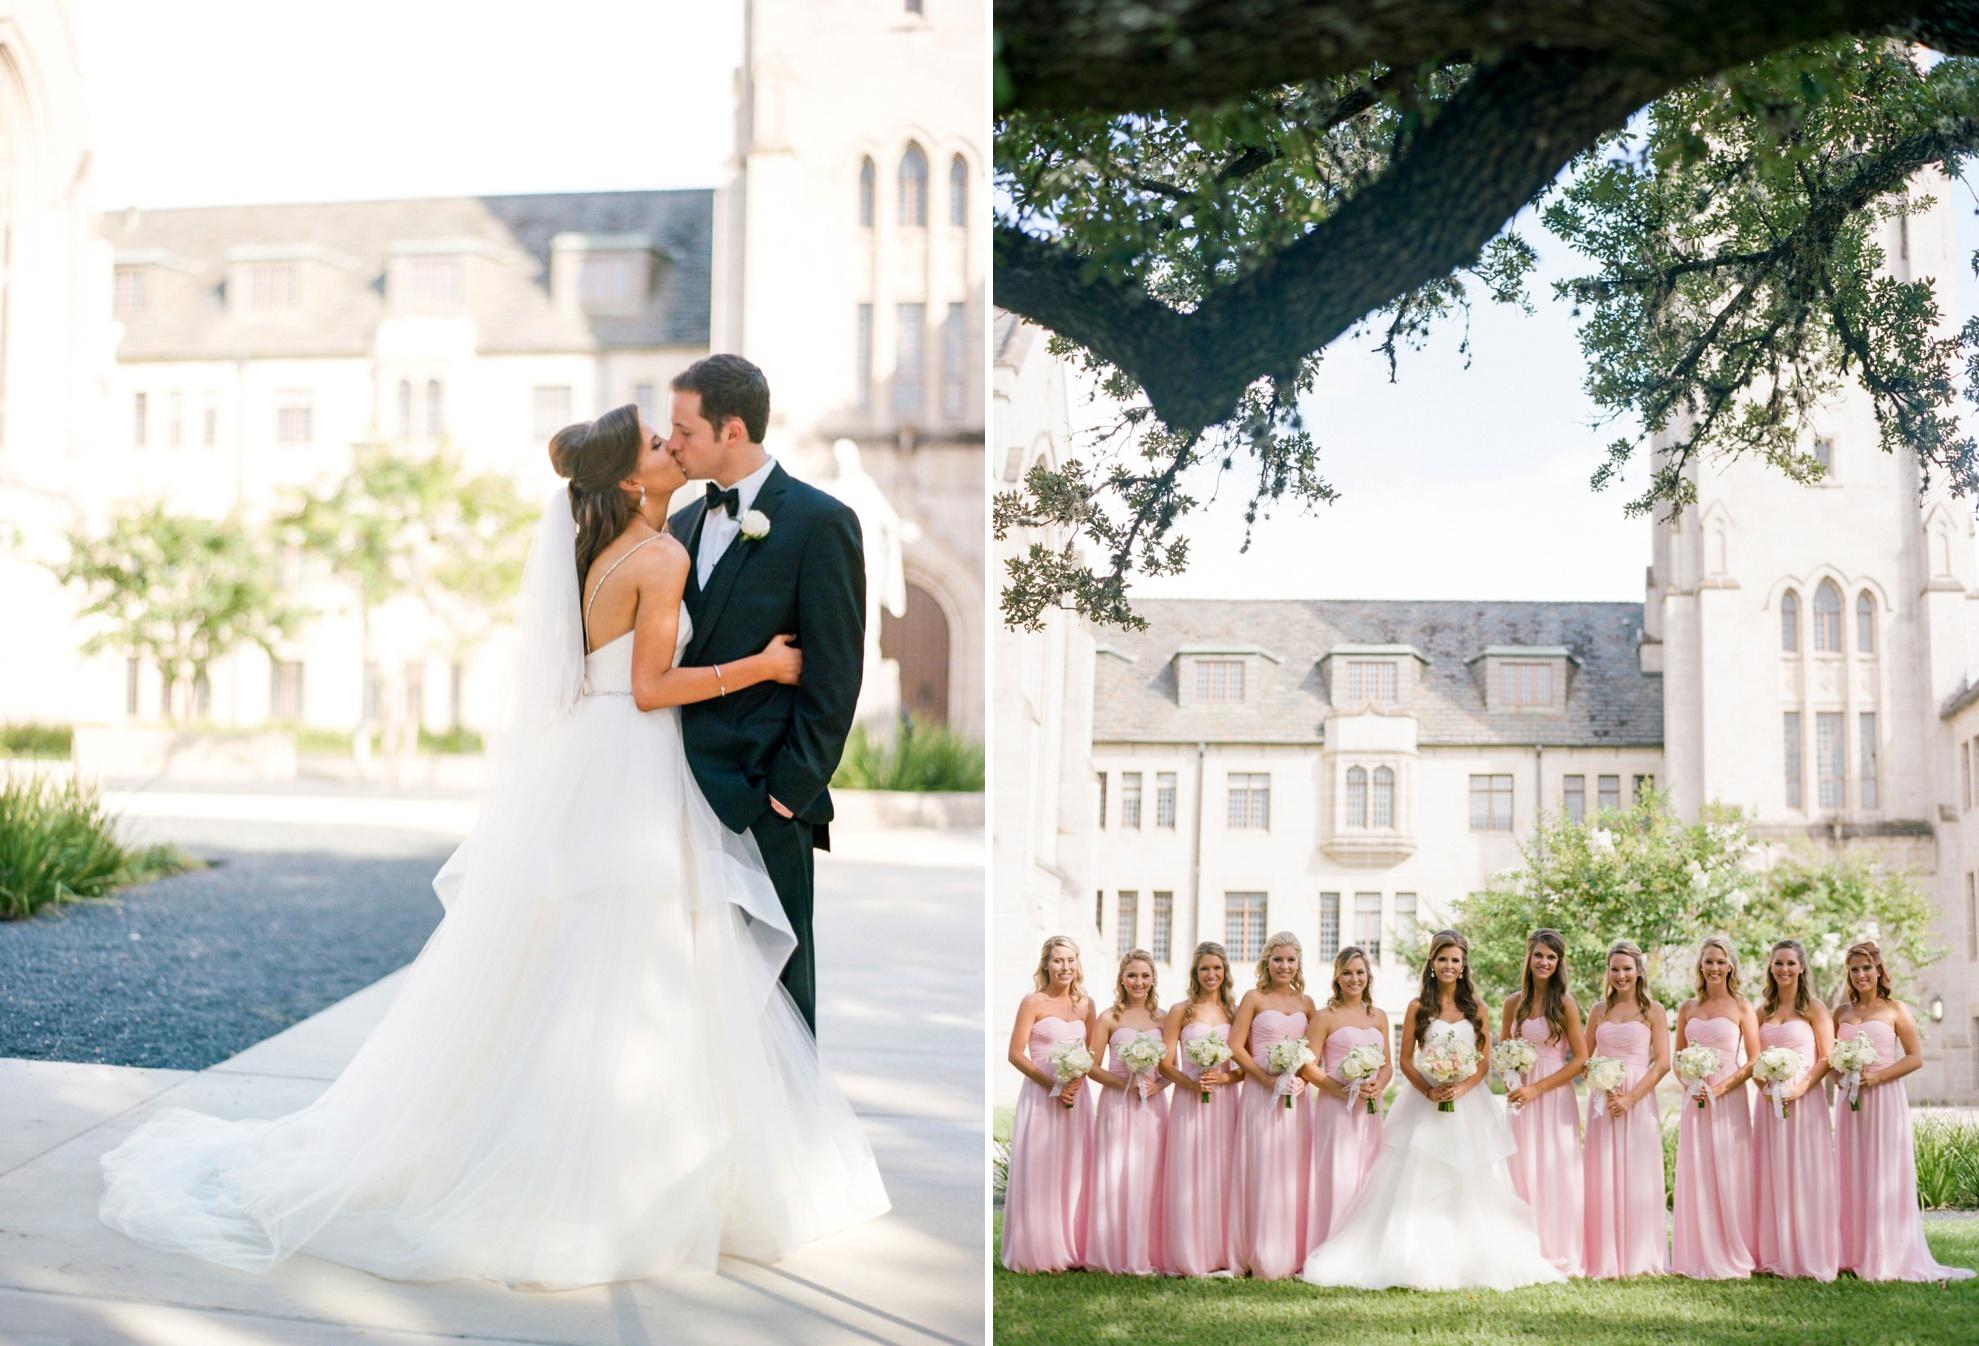 St-Paul's-United Methodist-Wedding-Houston-Photographer-Dana-Fernandez-Weddings-In-Houston-Magazine-Feature-2.jpg